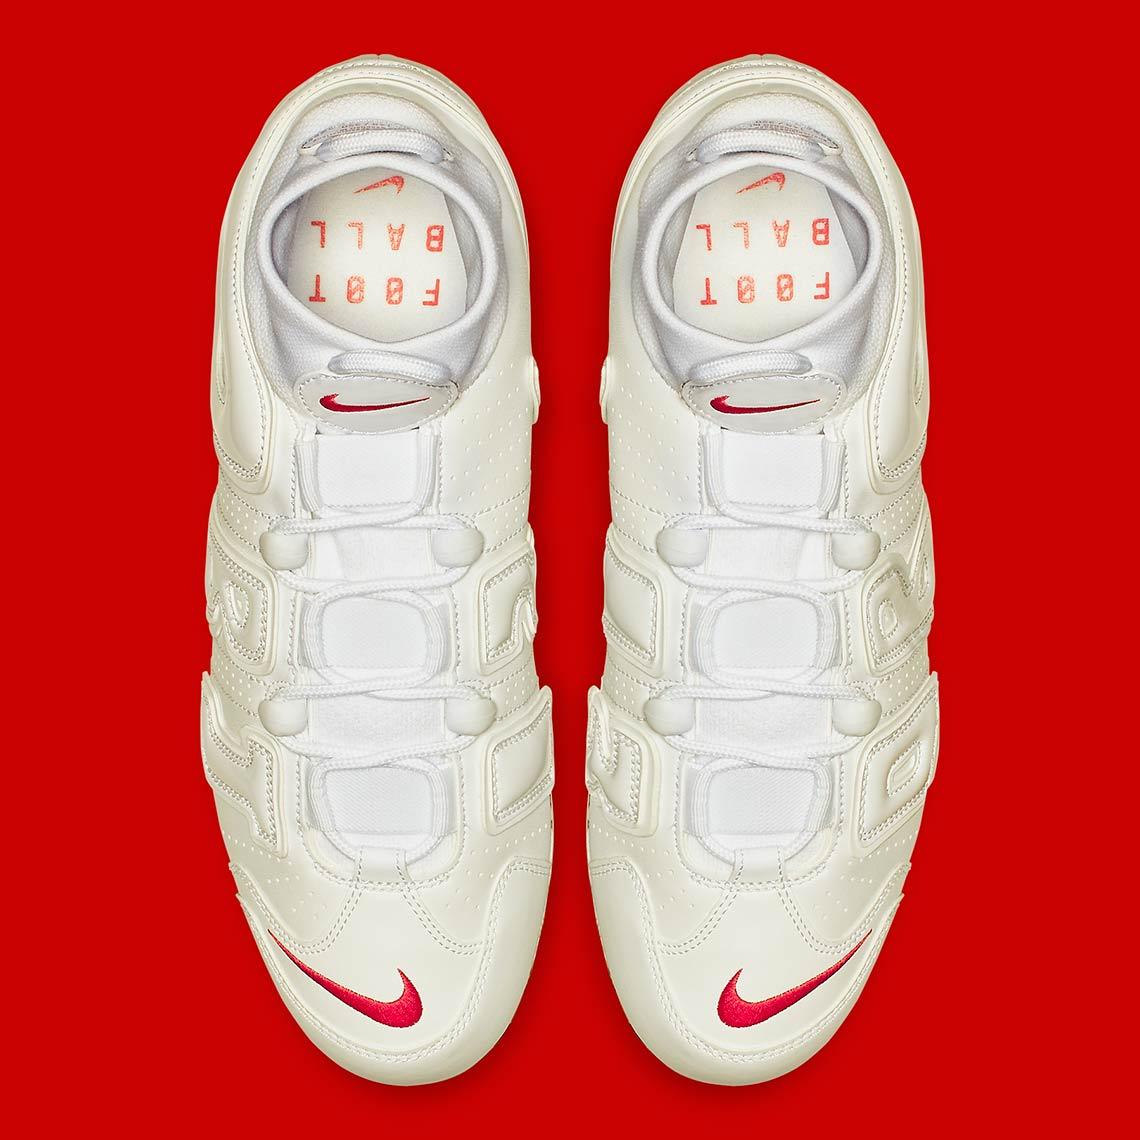 d3081dfd9 Odell Beckham Jr Nike Cleats BV8205-100 Buy Now